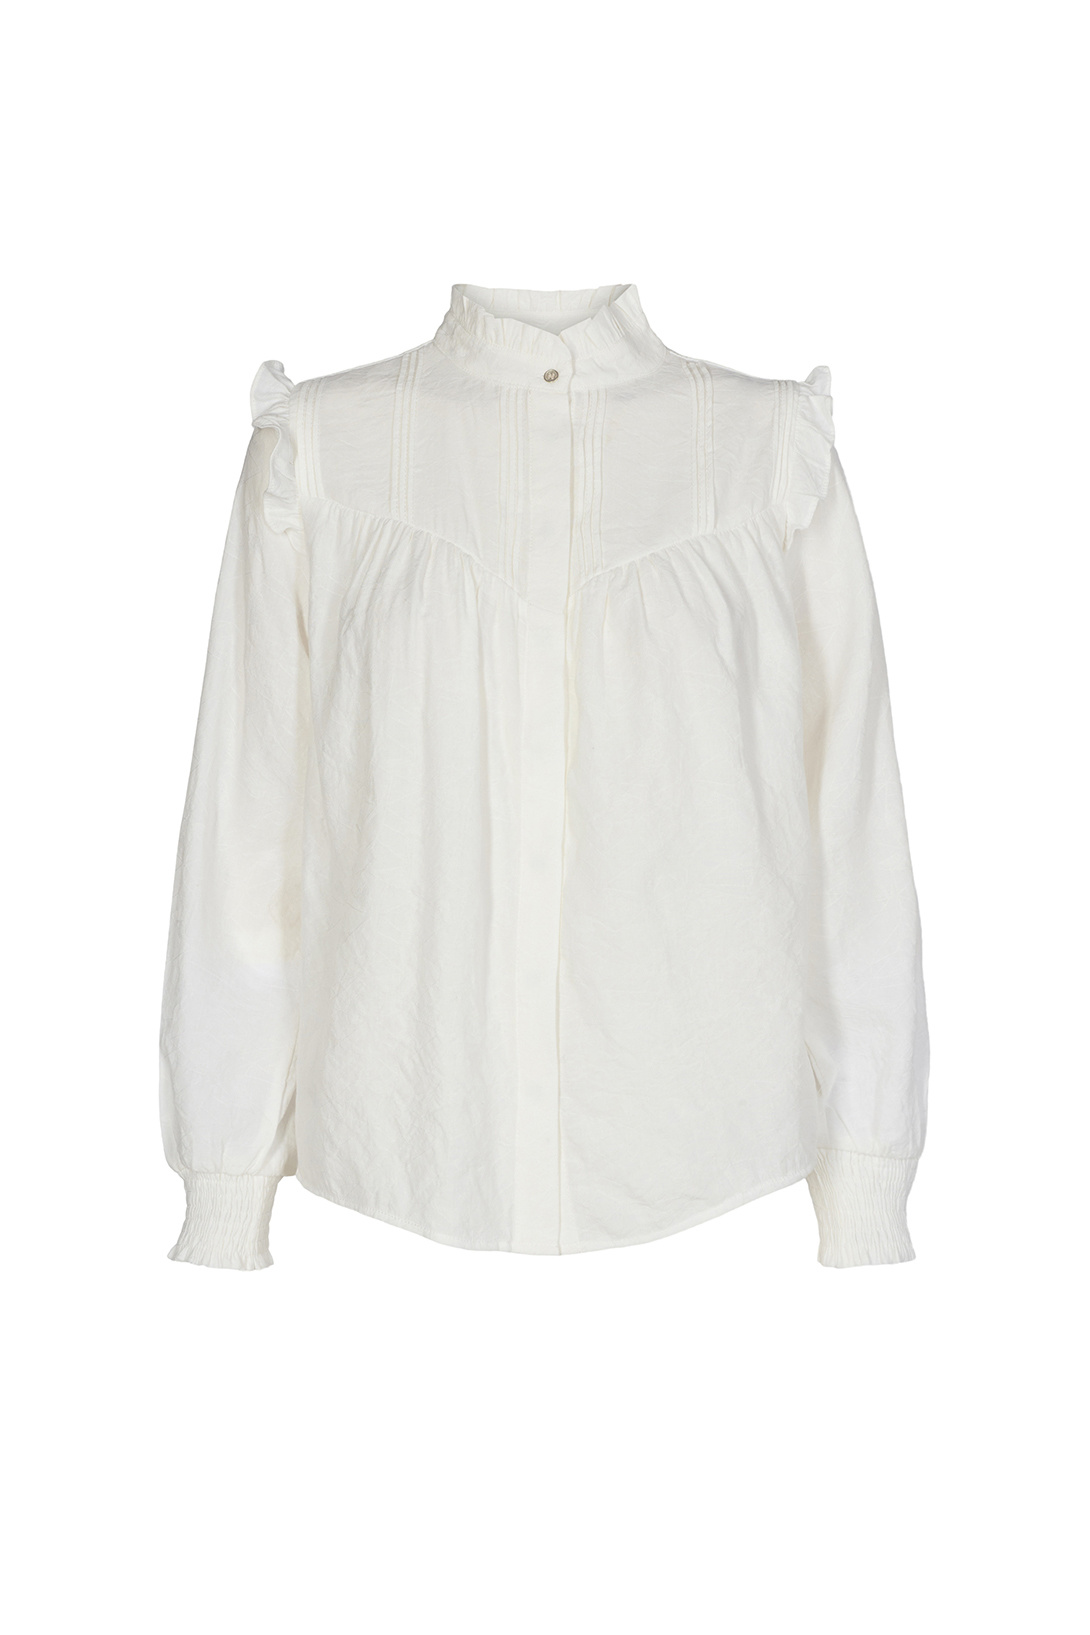 Co Couture Mason Shirt - Off White